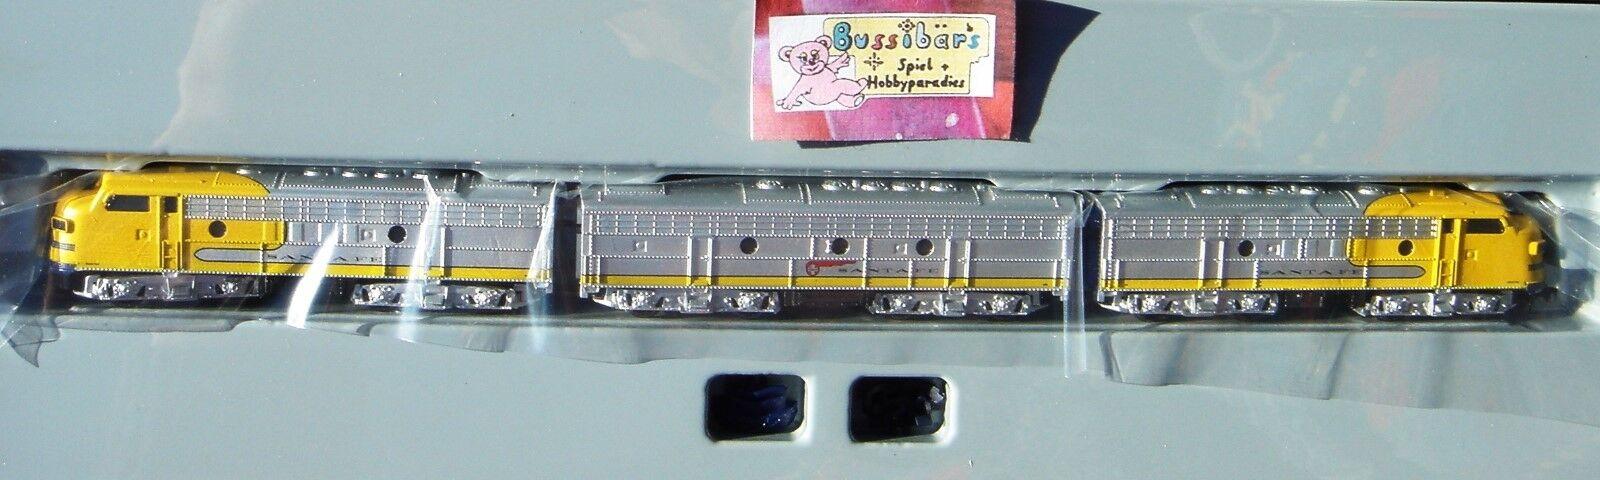 Z 88190 US-dieselelketrische locomotiva, triplice unità EP. III-NUOVO